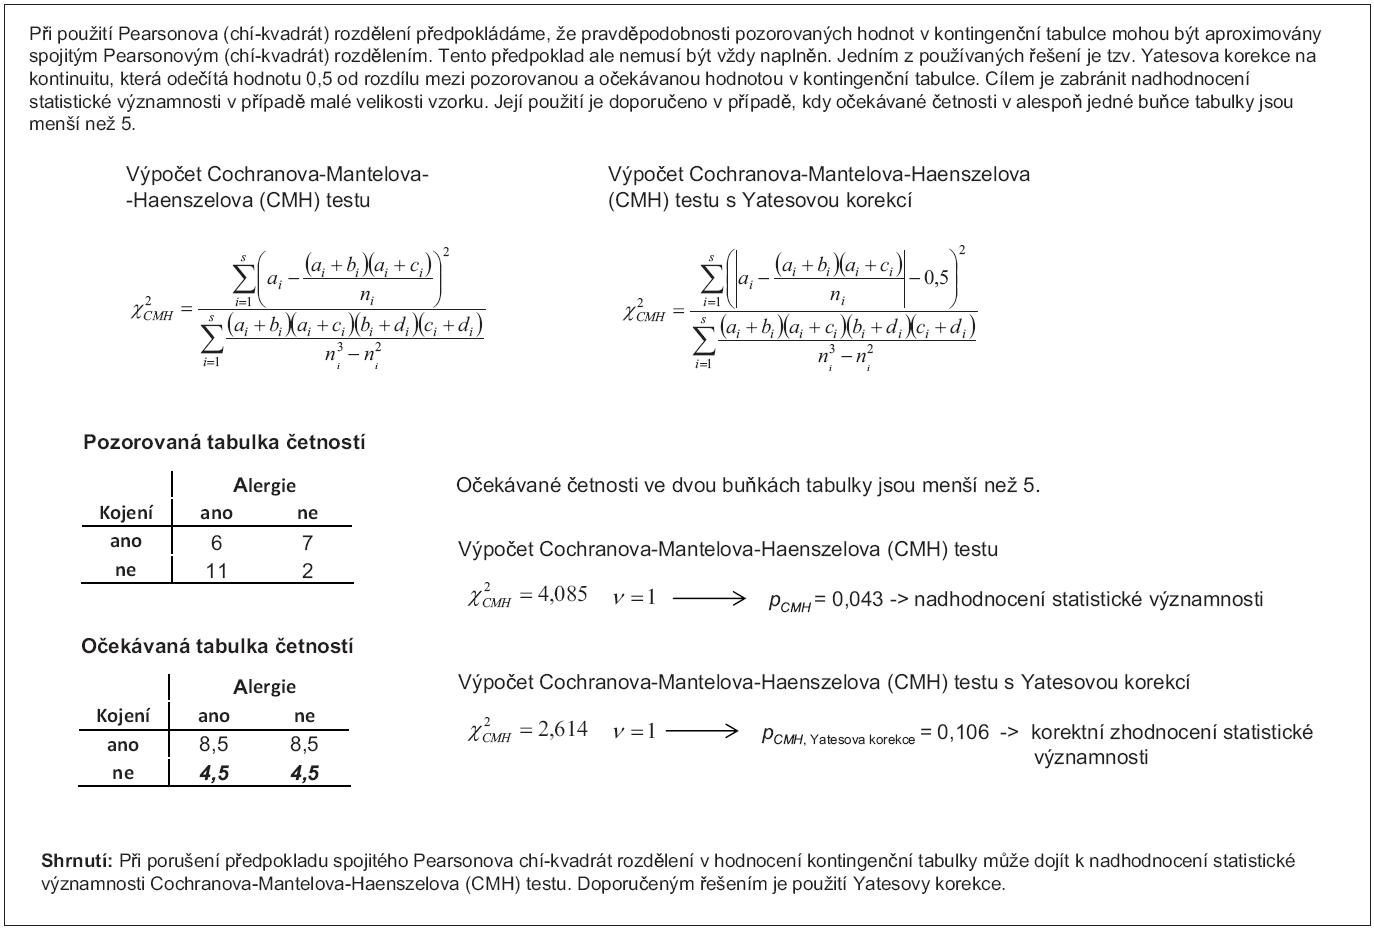 Příklad 3. Výpočet Cochranova-Mantelova-Haenszelova (CMH) testu s korekcí na kontinuitu.